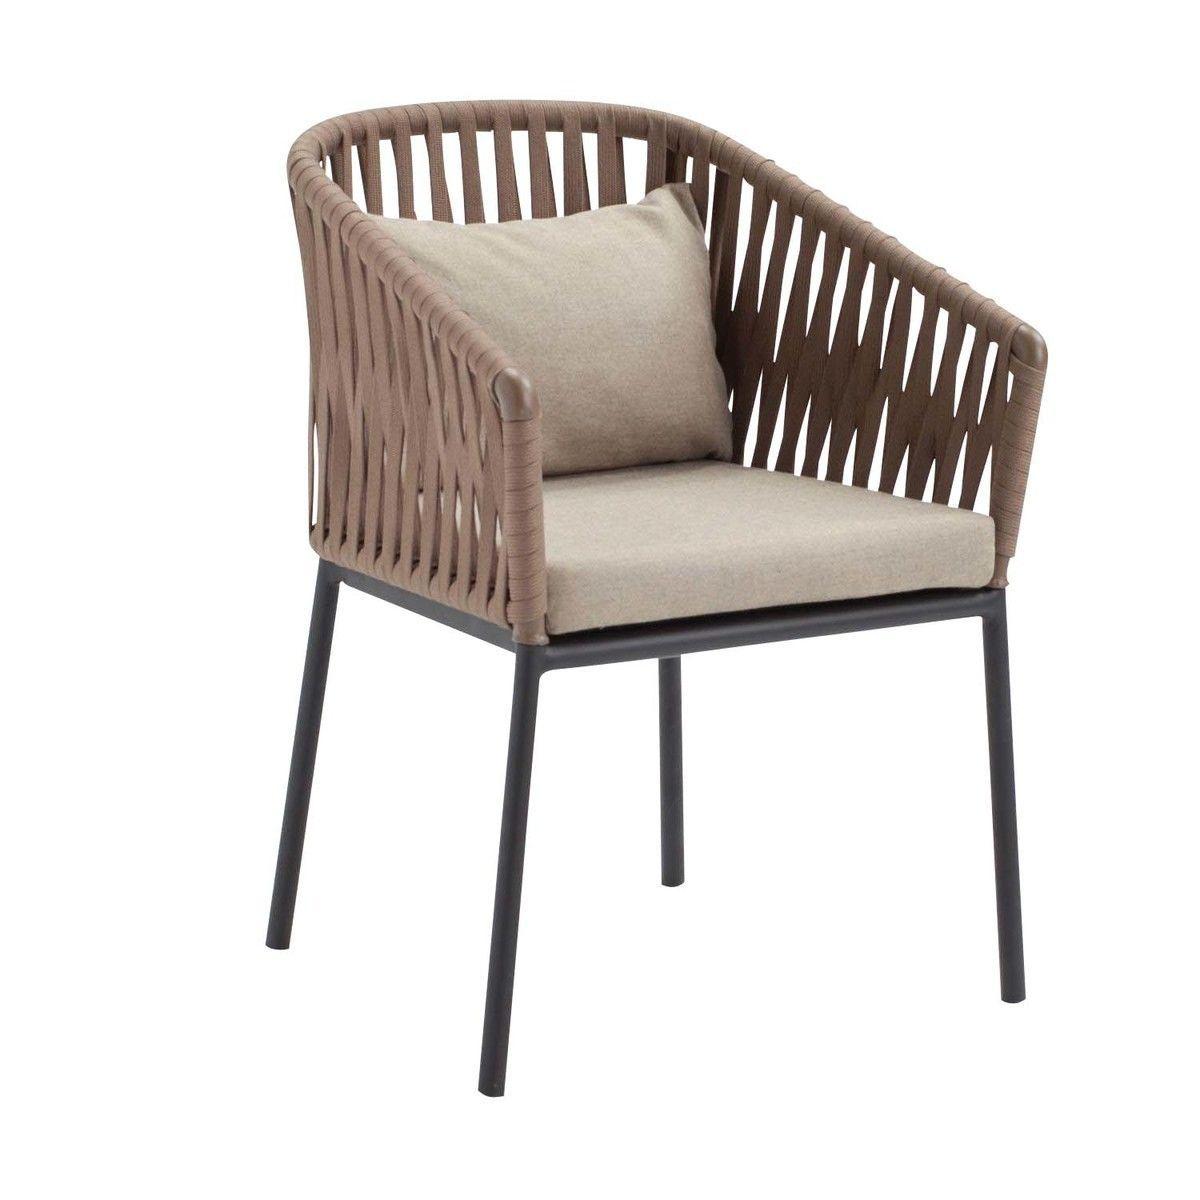 Bitta - Chaise avec accoudoirs de jardin | Kettal | AmbienteDirect.com